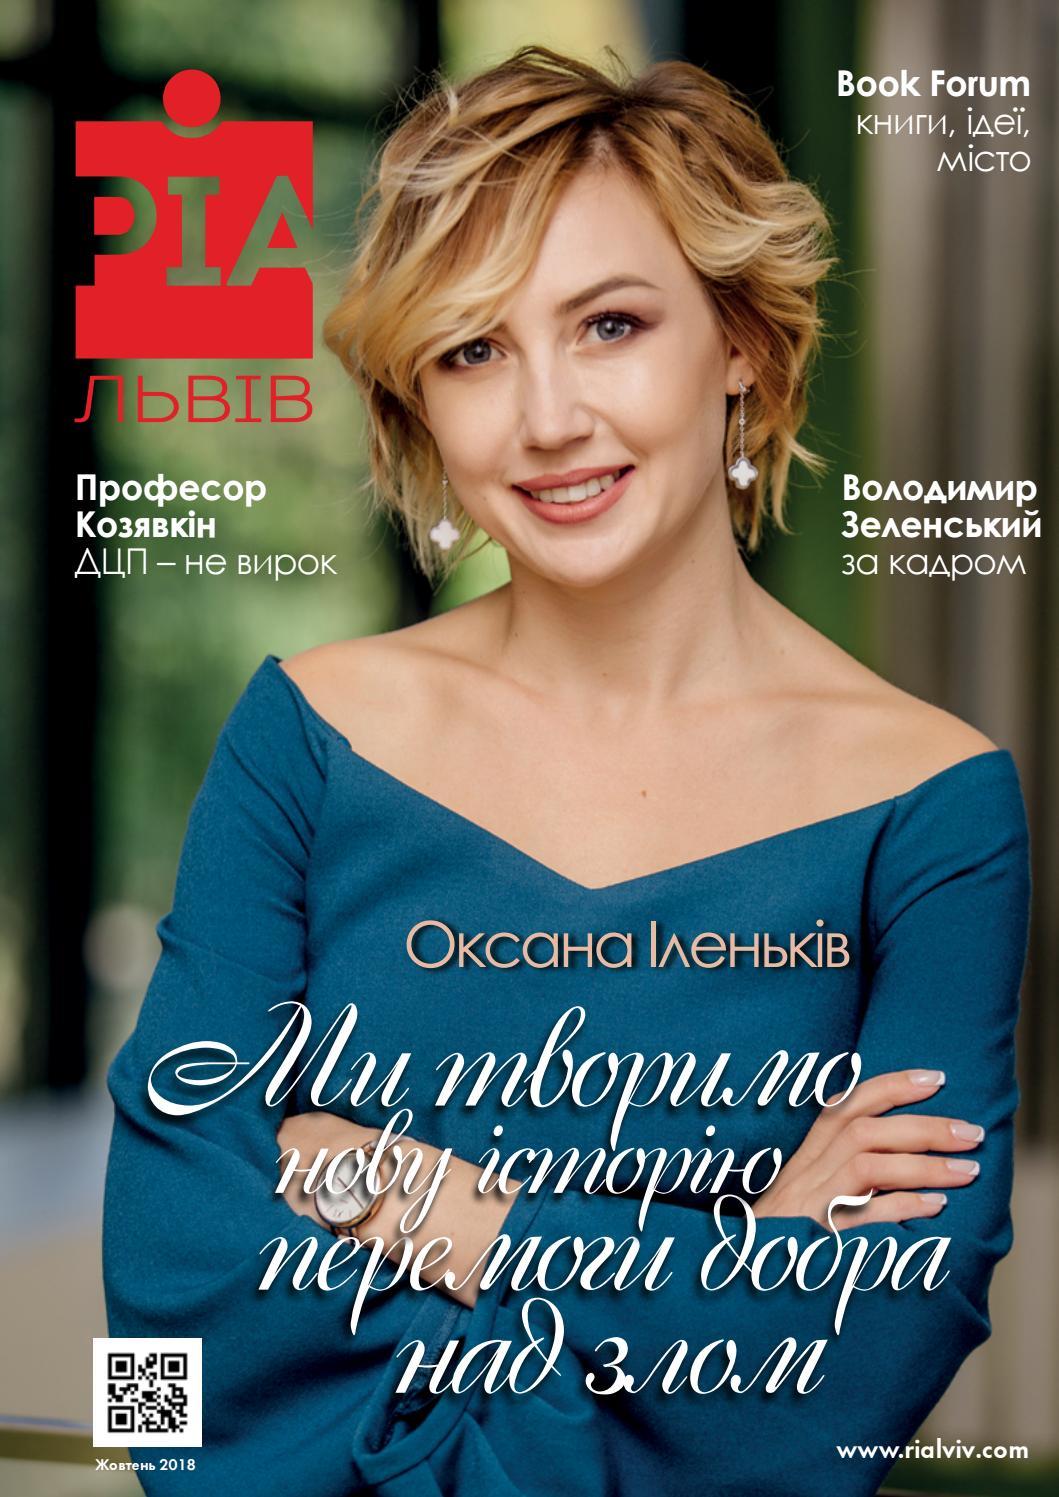 РІА Львів №20 (жовтень 2018) by РІА Львів - issuu ee9a1ee13142a